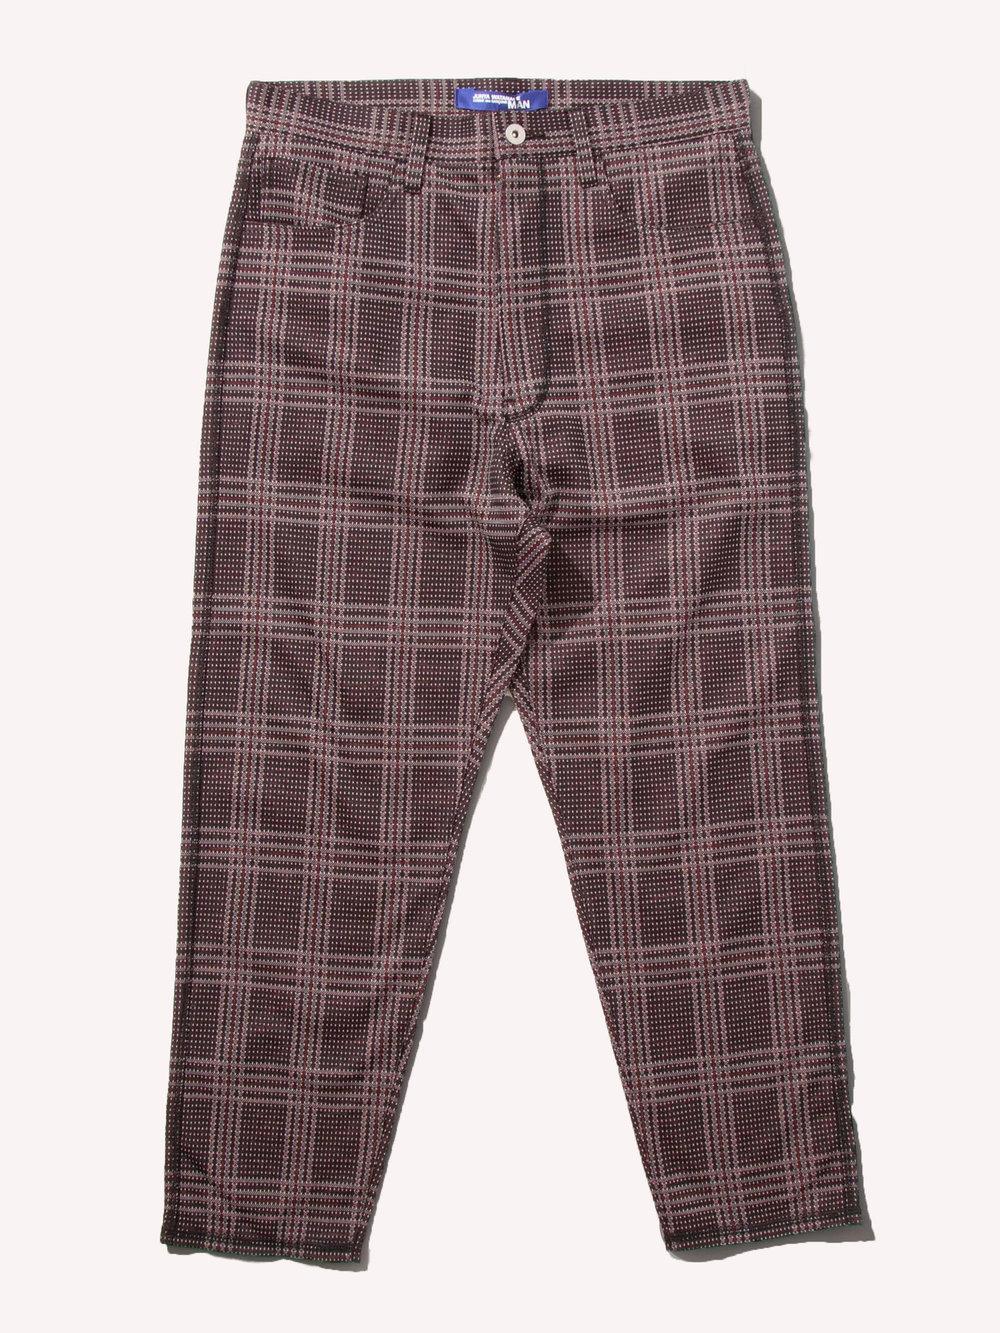 JUNYA_WATANABE_5_Pkt_Patterned_Trouser.jpg